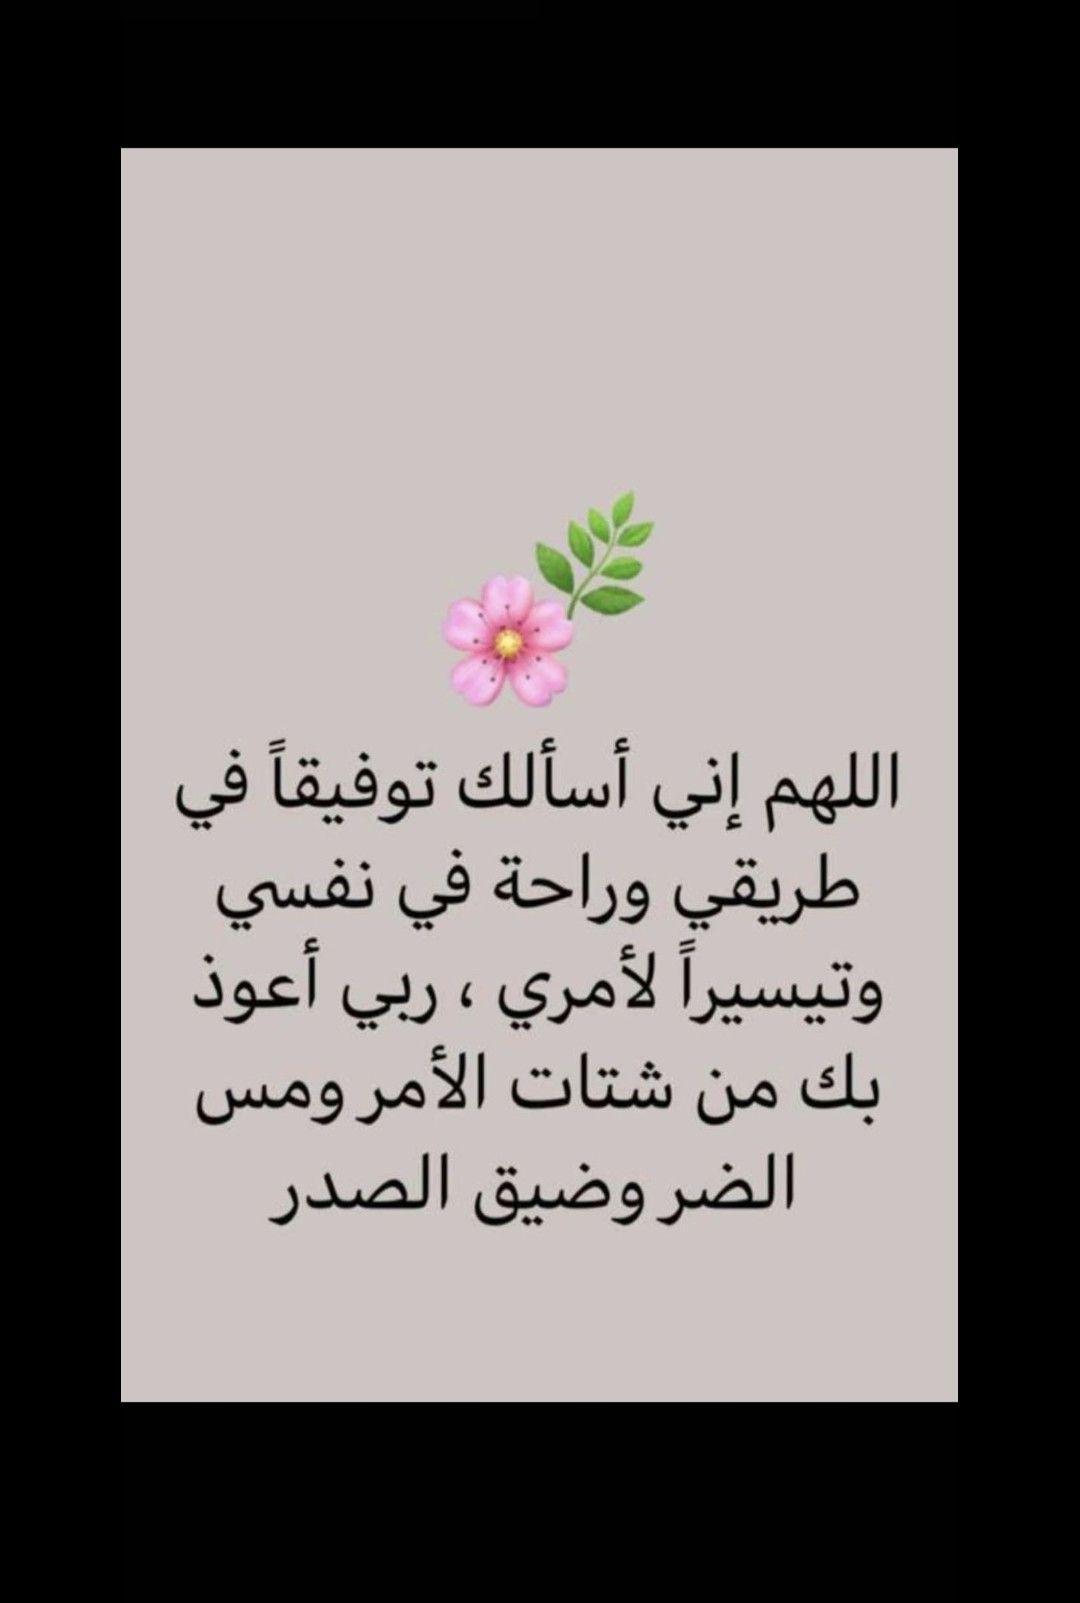 Pin By Fatima Alshreef On Allah Home Decor Decals Home Decor Decor